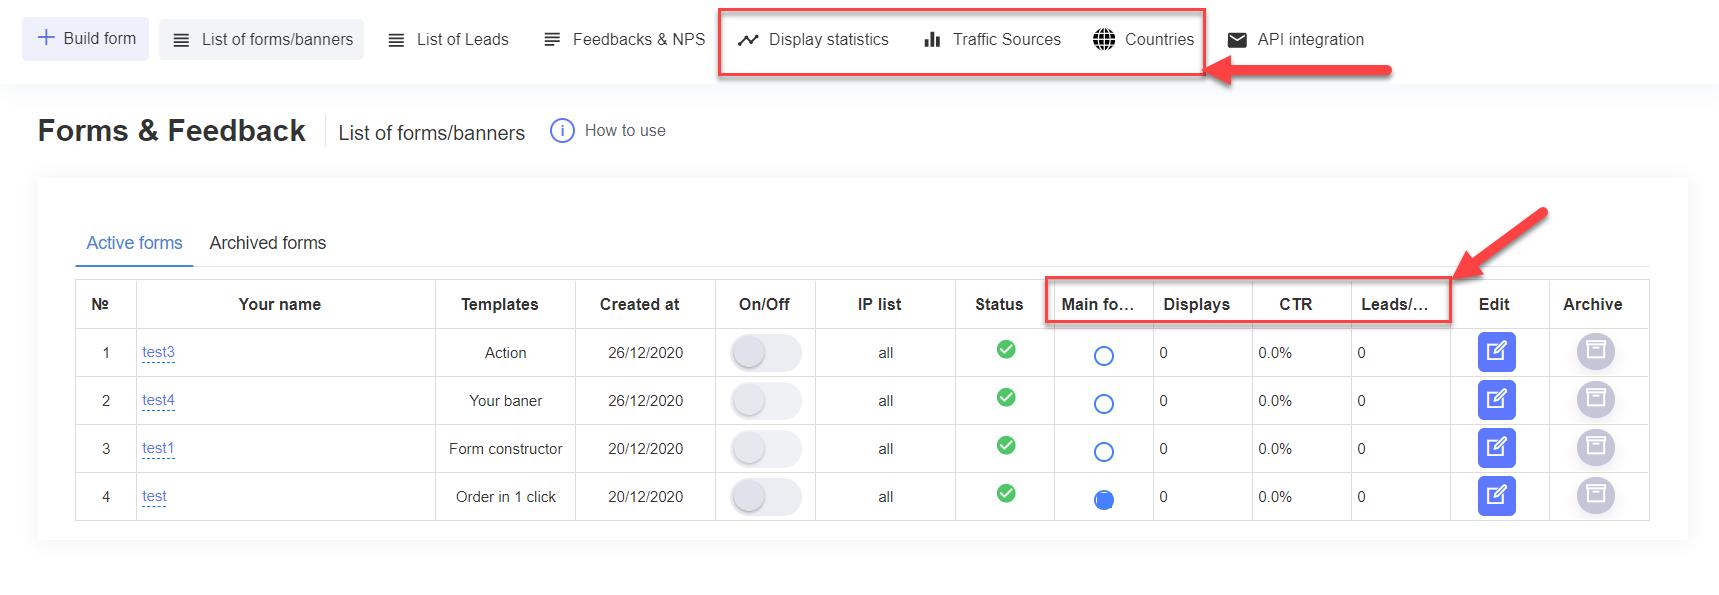 Plerdy popup data and analytics